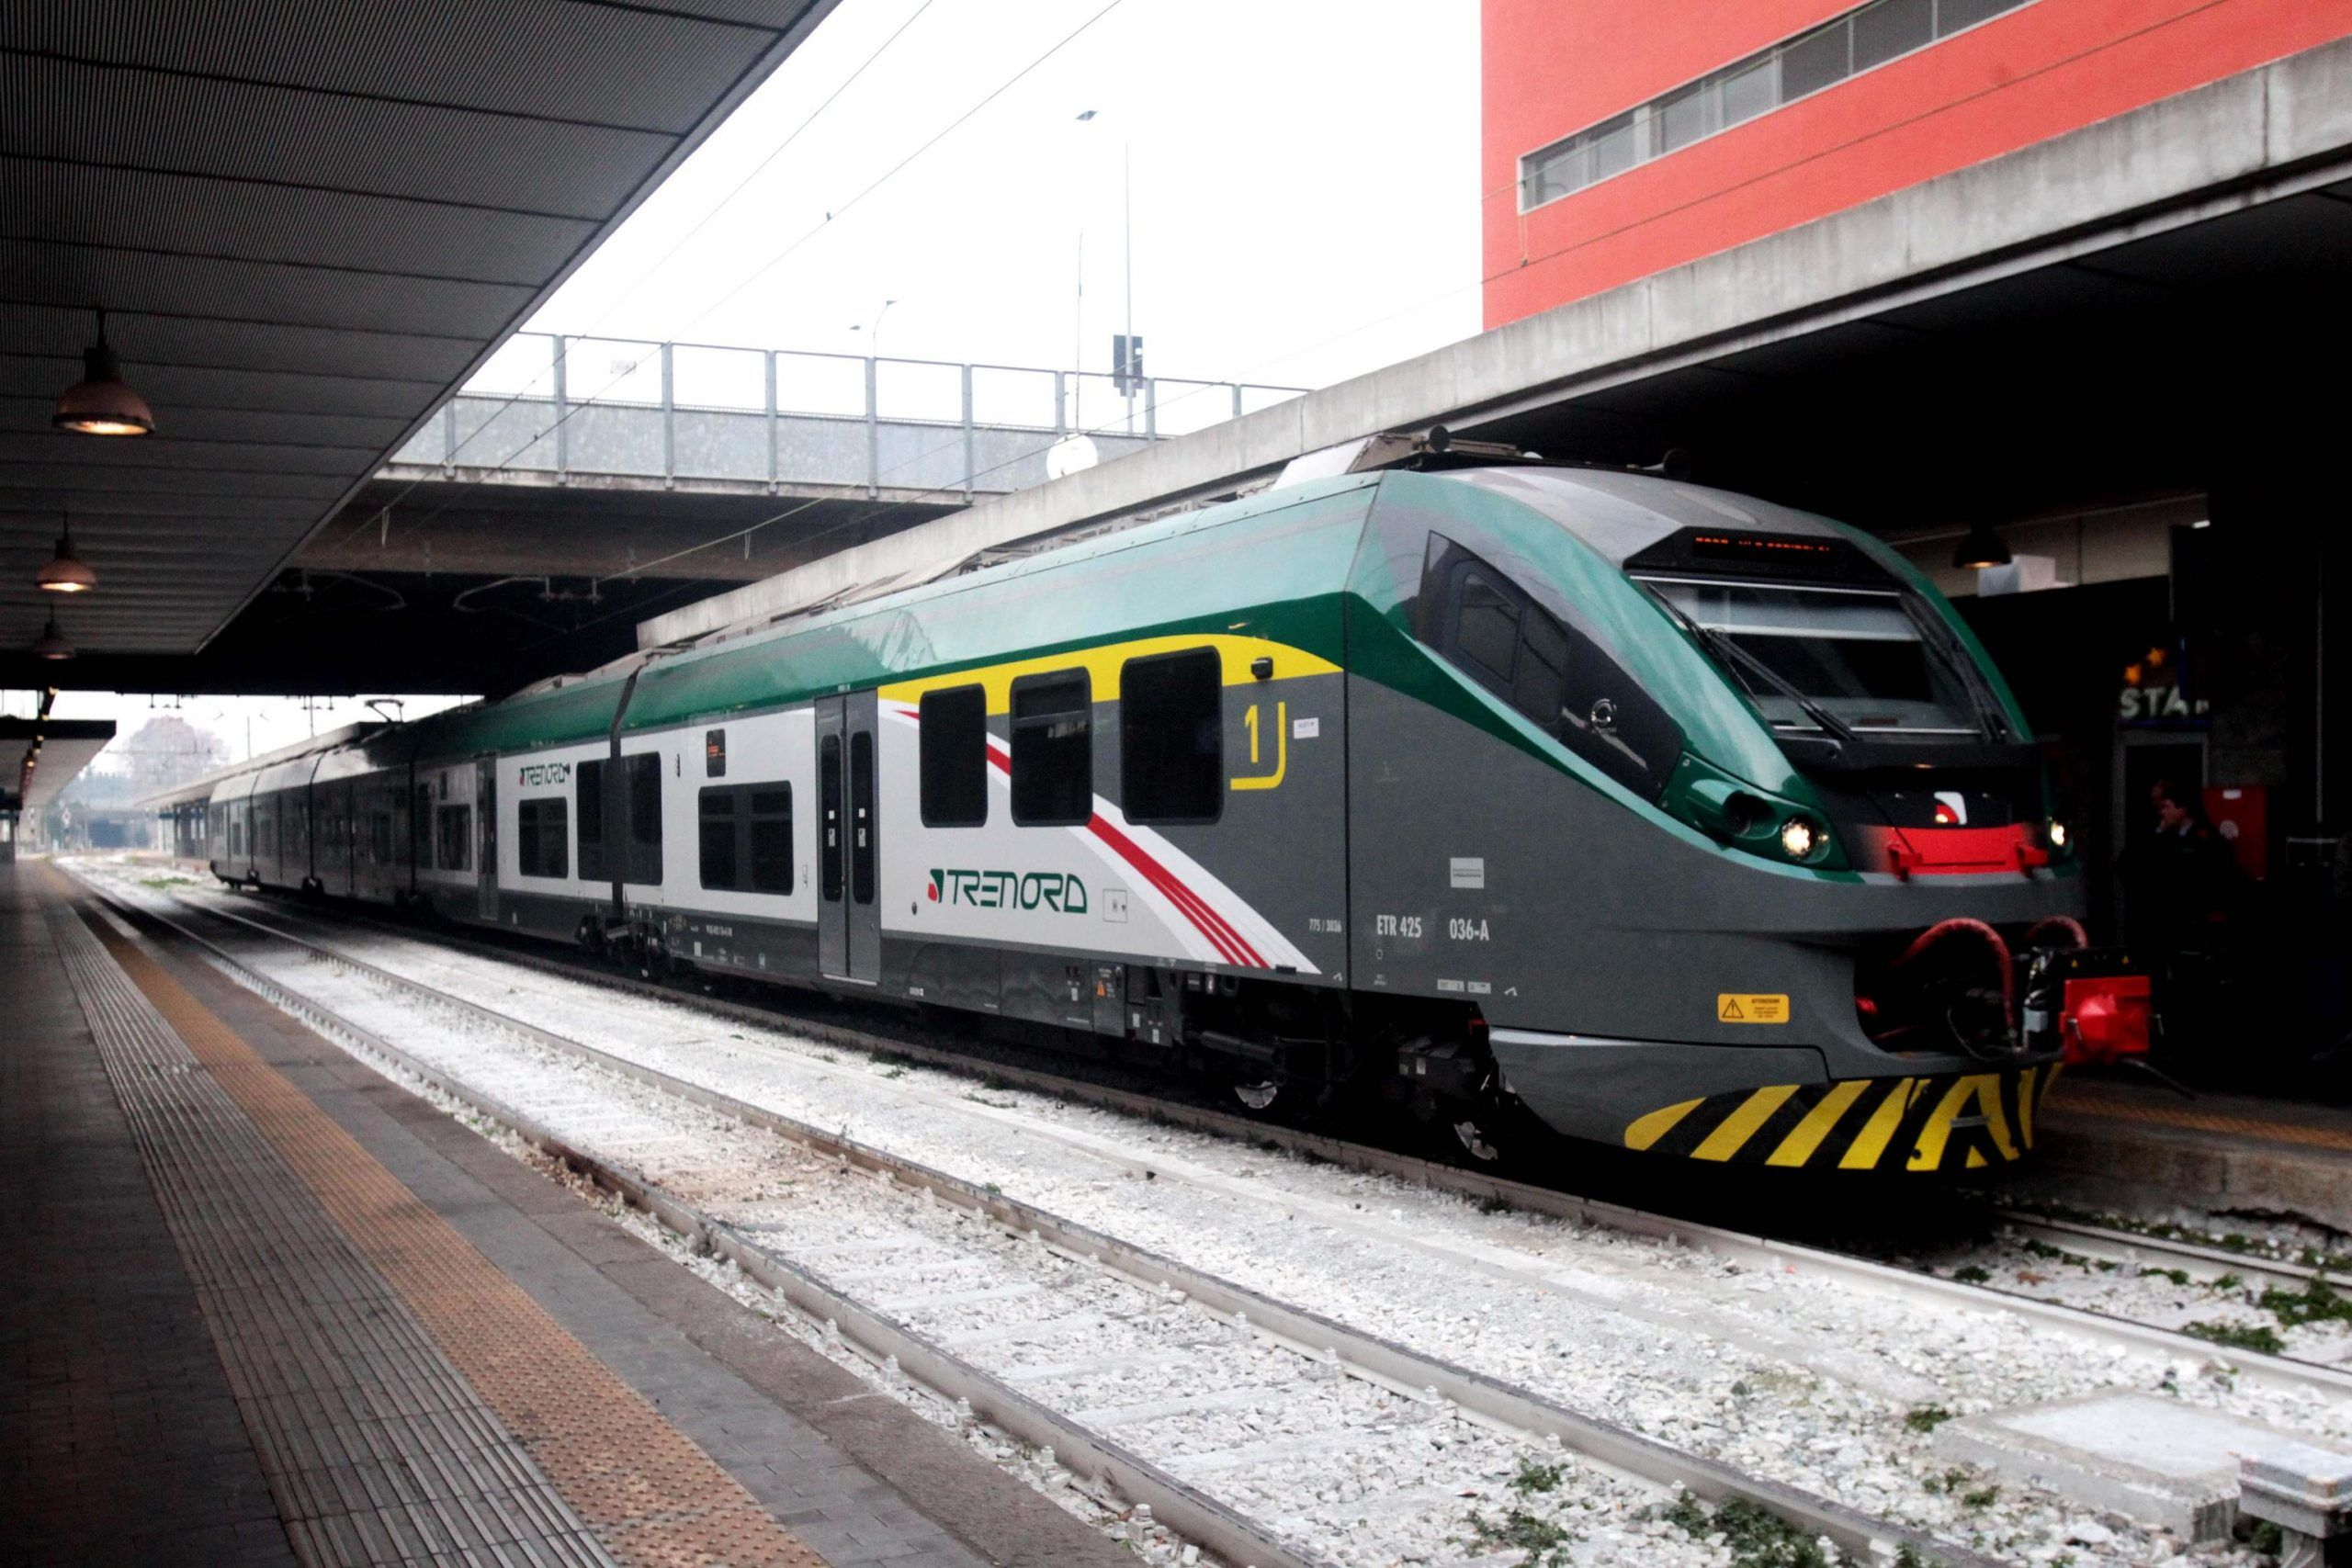 Trenord a Milano